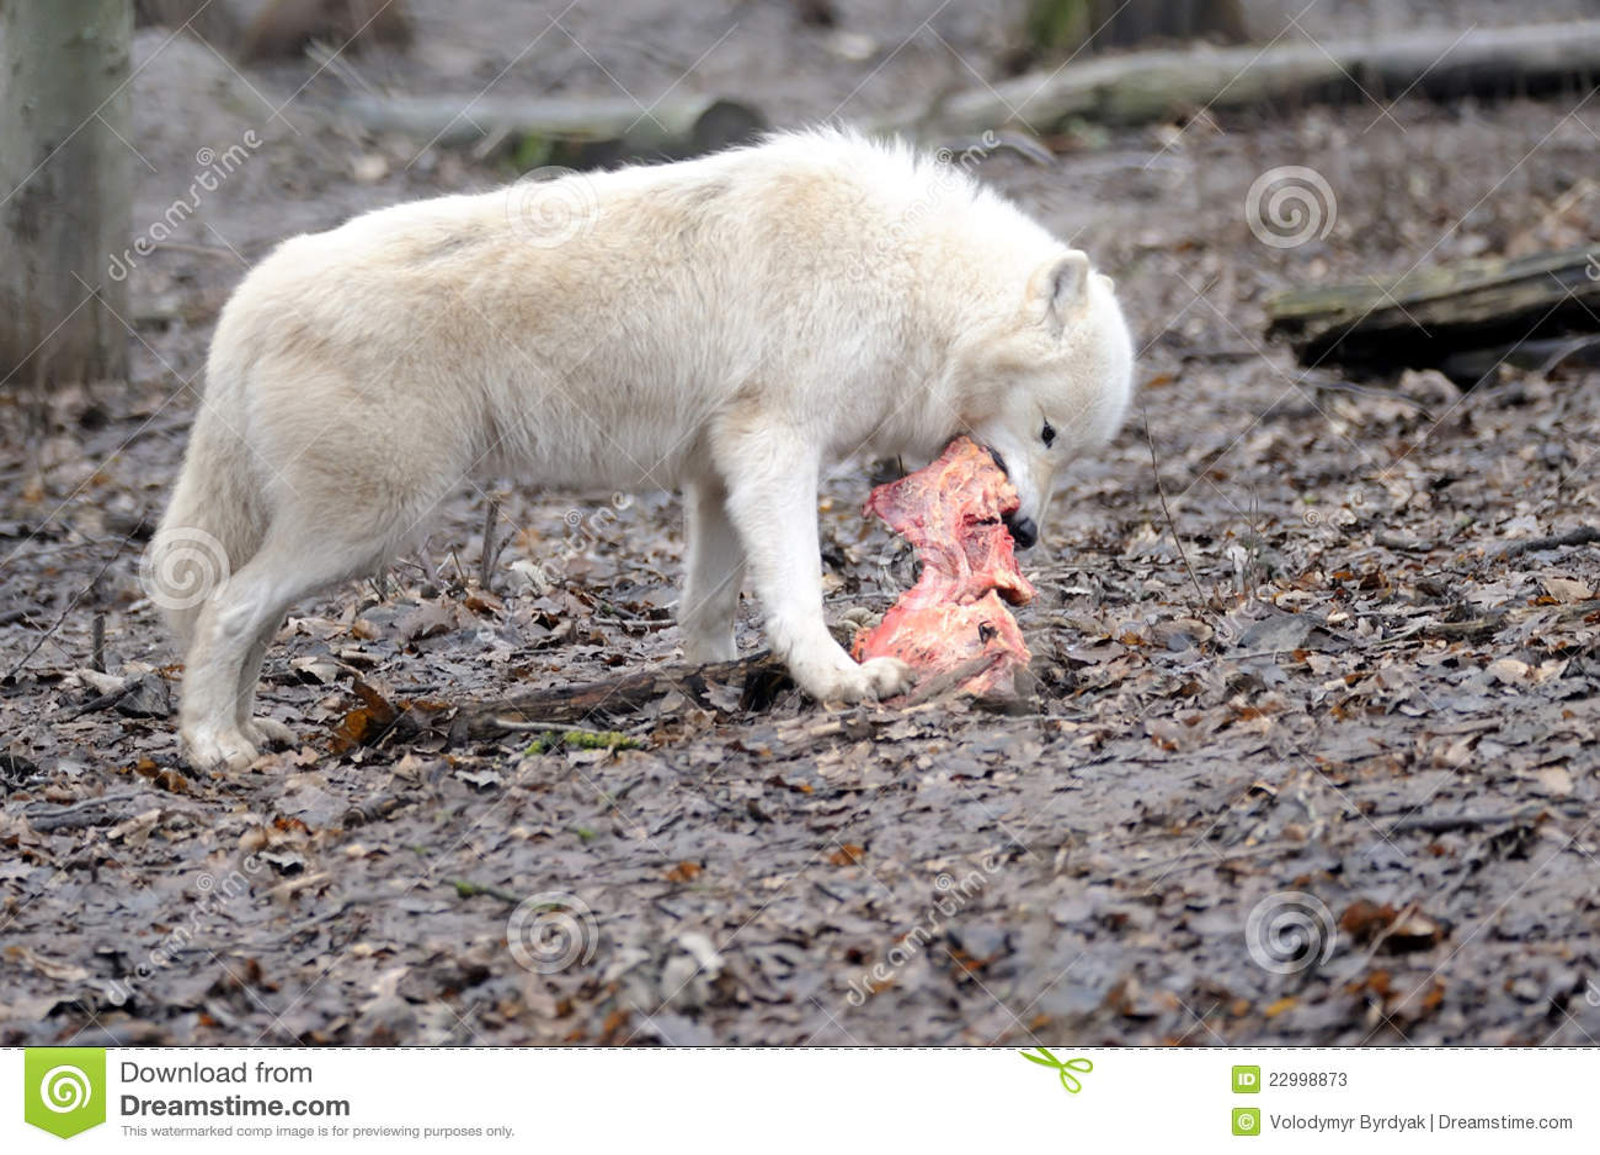 how to eat tapir meat